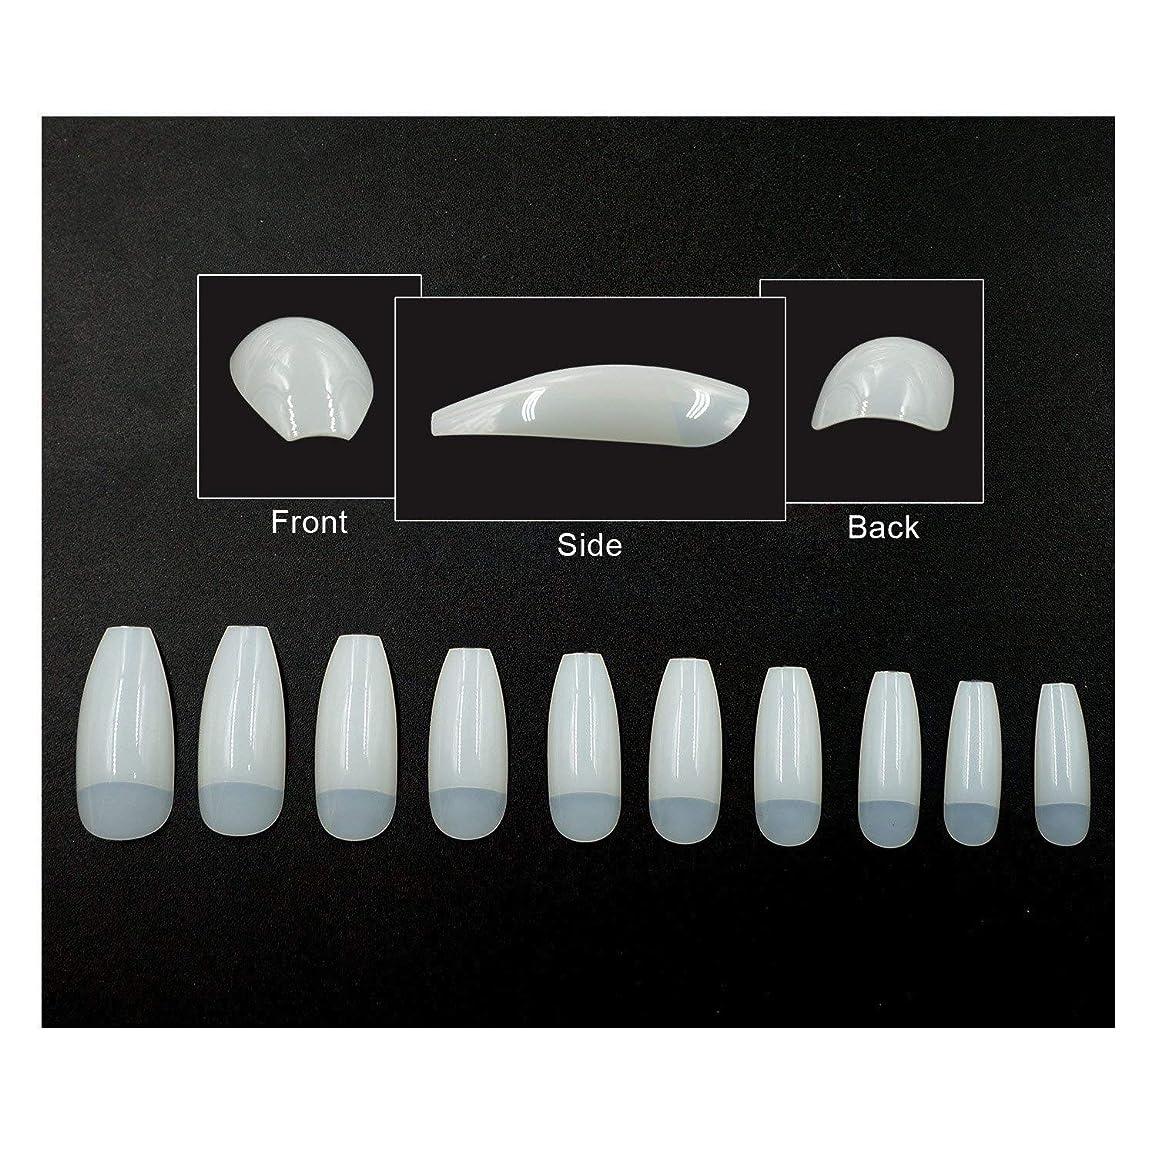 Murakush 偽ネイル 偽爪 ネイルアート 500個 3d UVジェル 自己接着 スライス ポリマークレイ diyネイル マニキュアの装飾 ネイルチップ ネイルデコレーション 手作り 可愛い